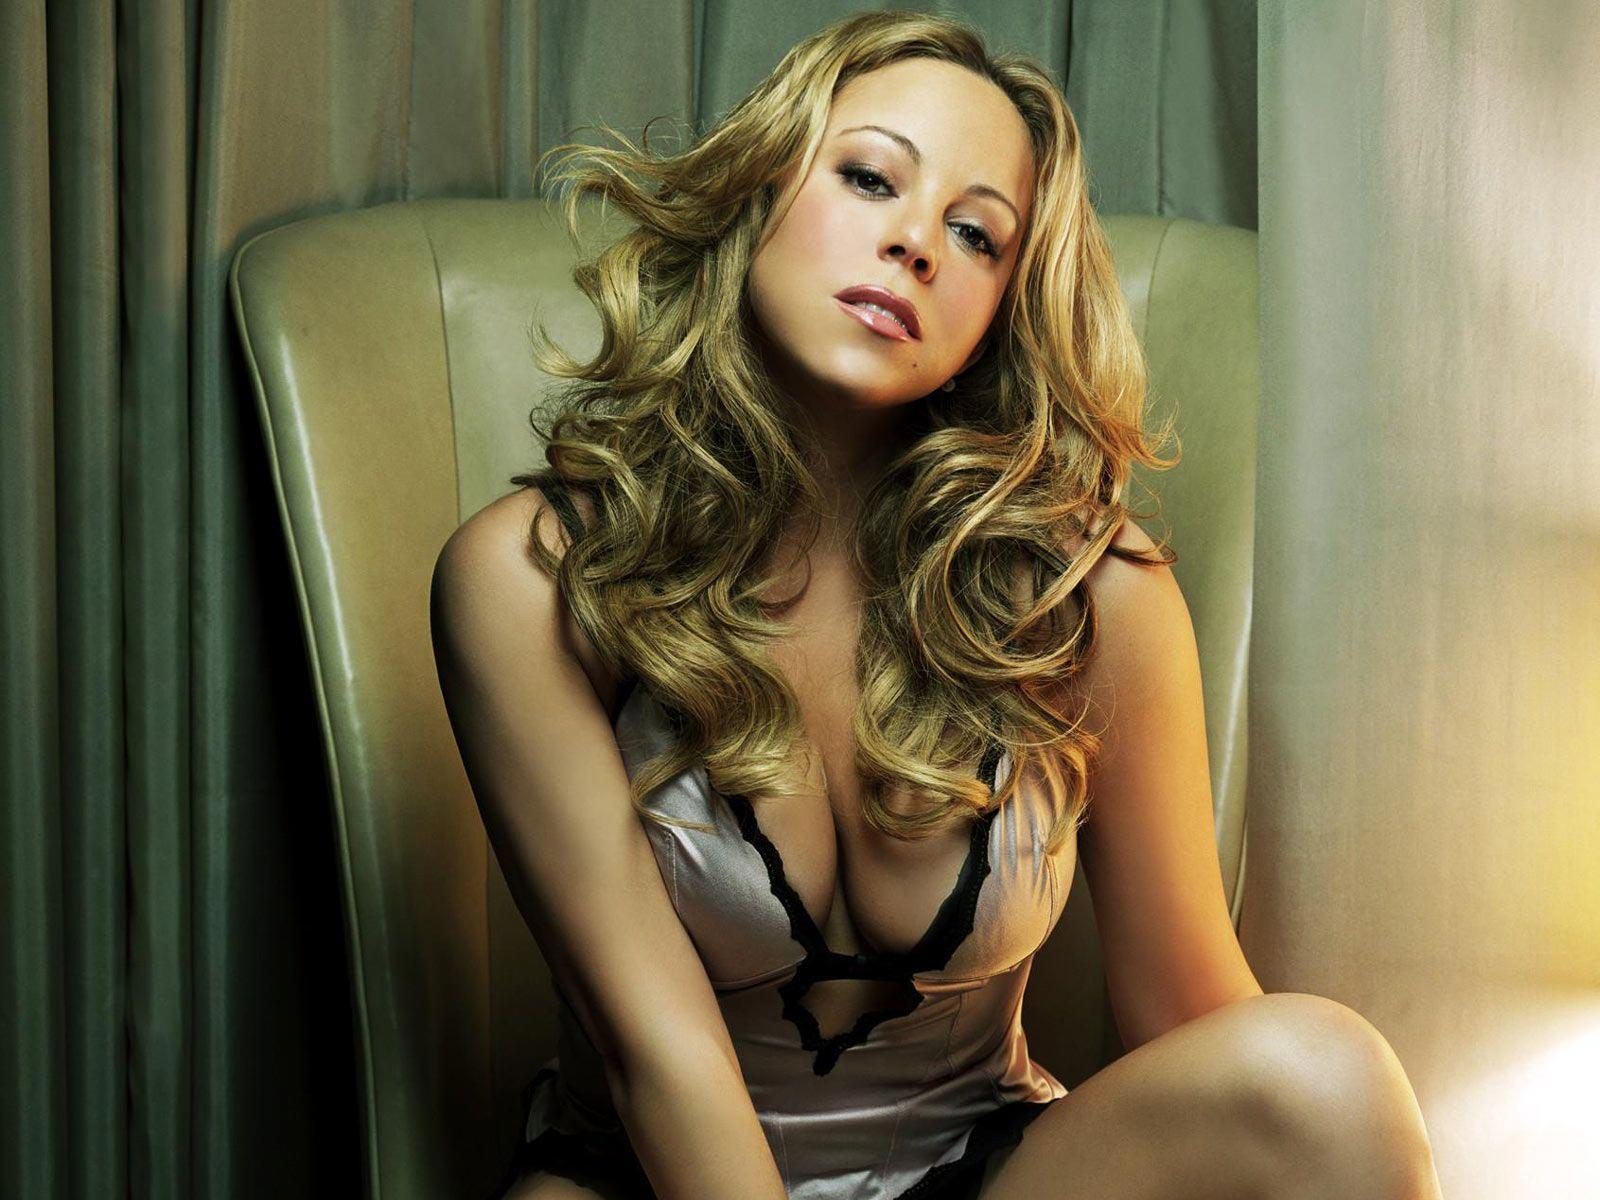 Sexy diva mariah carey shows off her curves in festive - Mariah carey diva ...